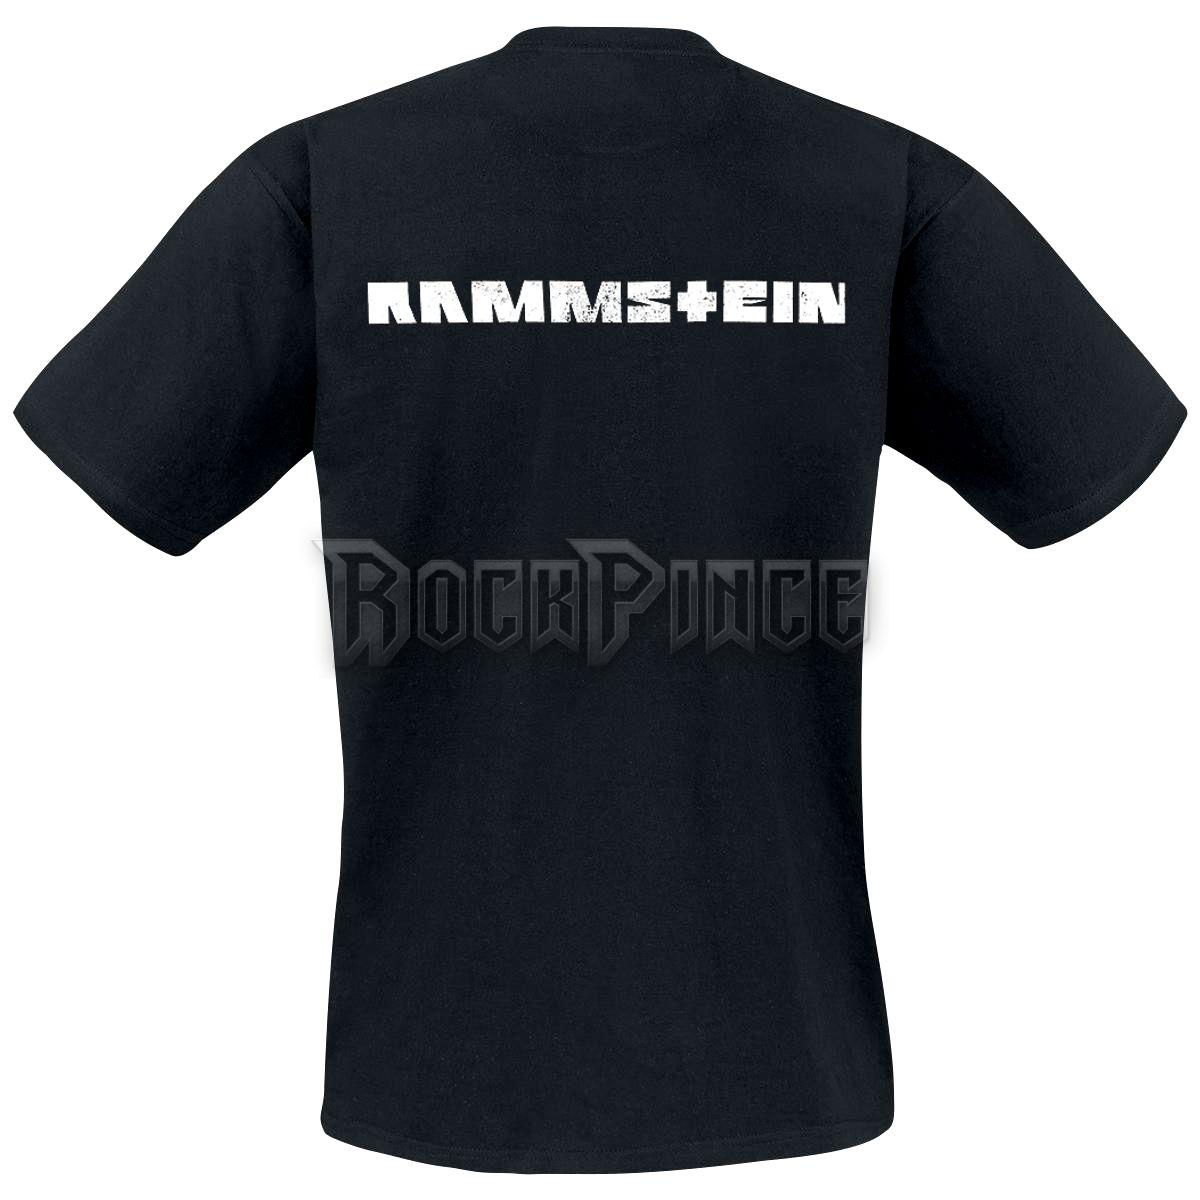 Rammstein - TDM-1606 - unisex póló